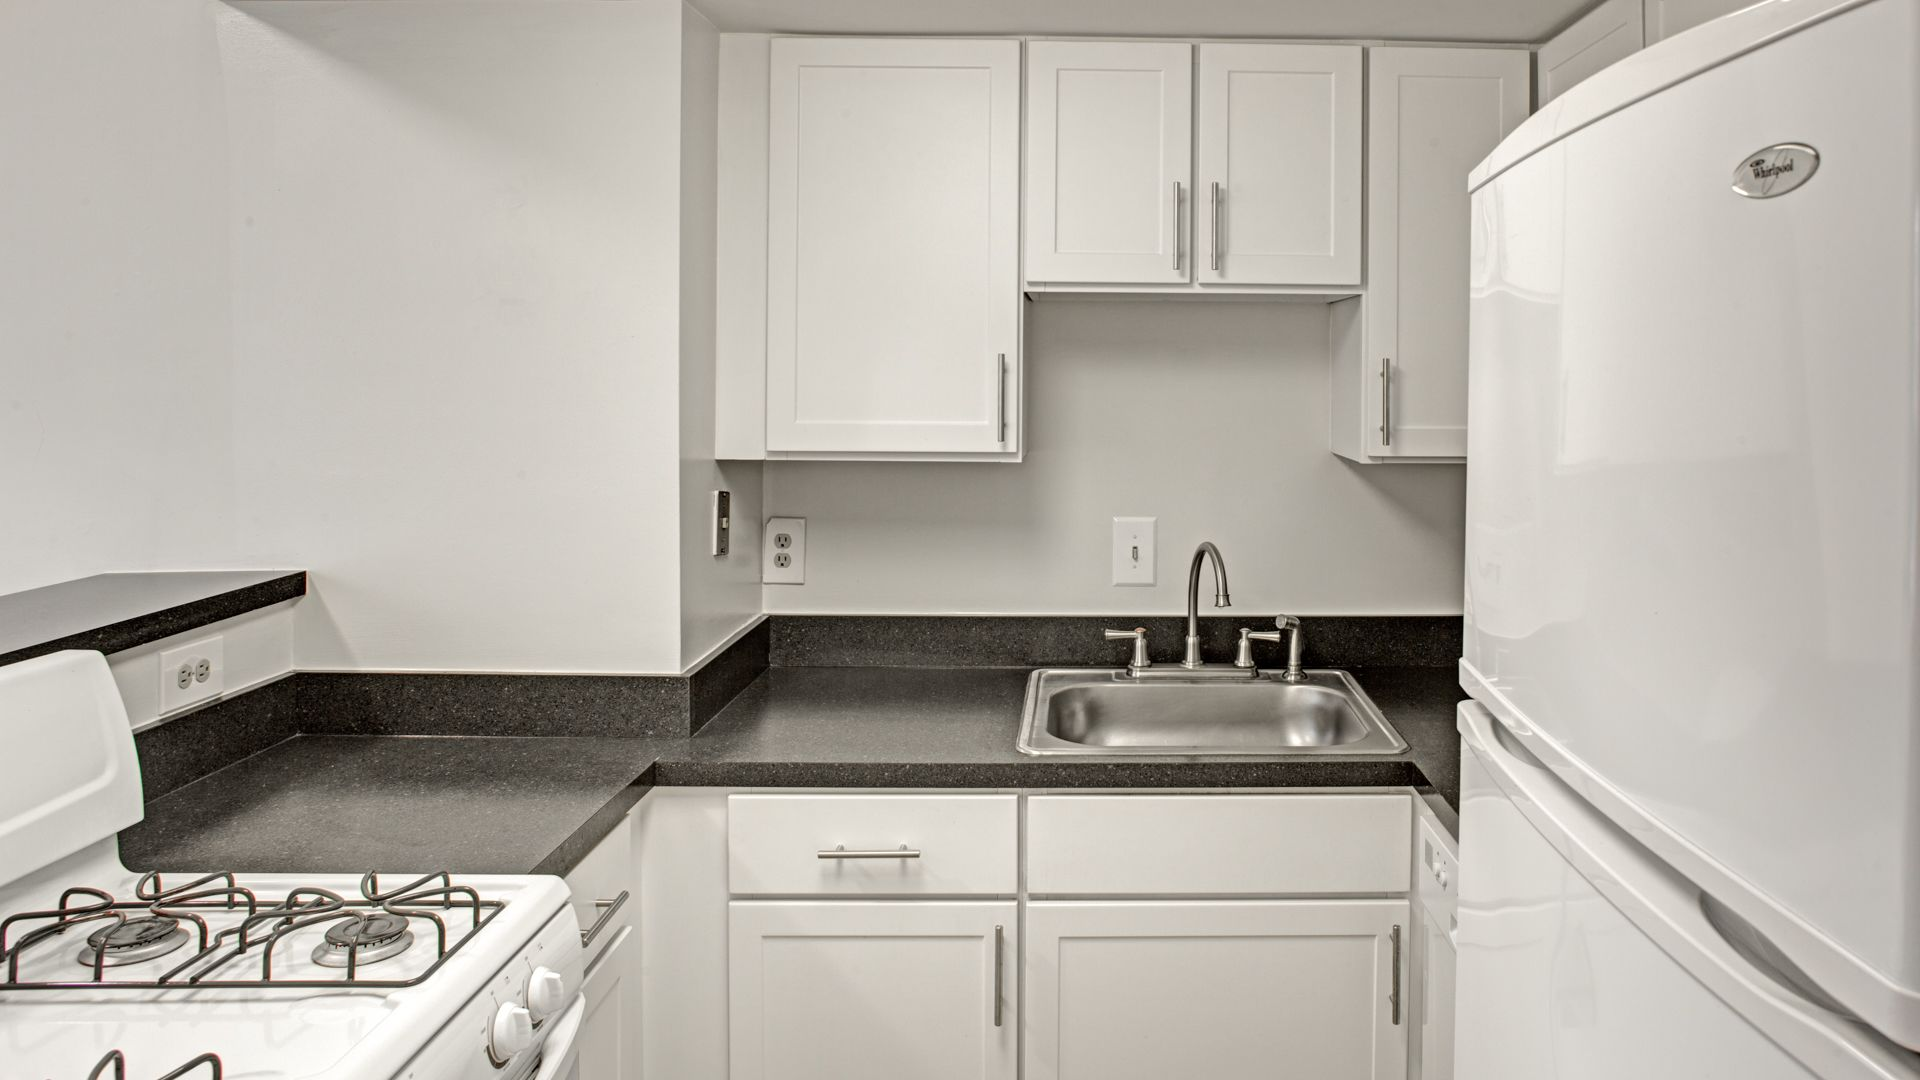 Sheffield Court Apartments - Kitchen